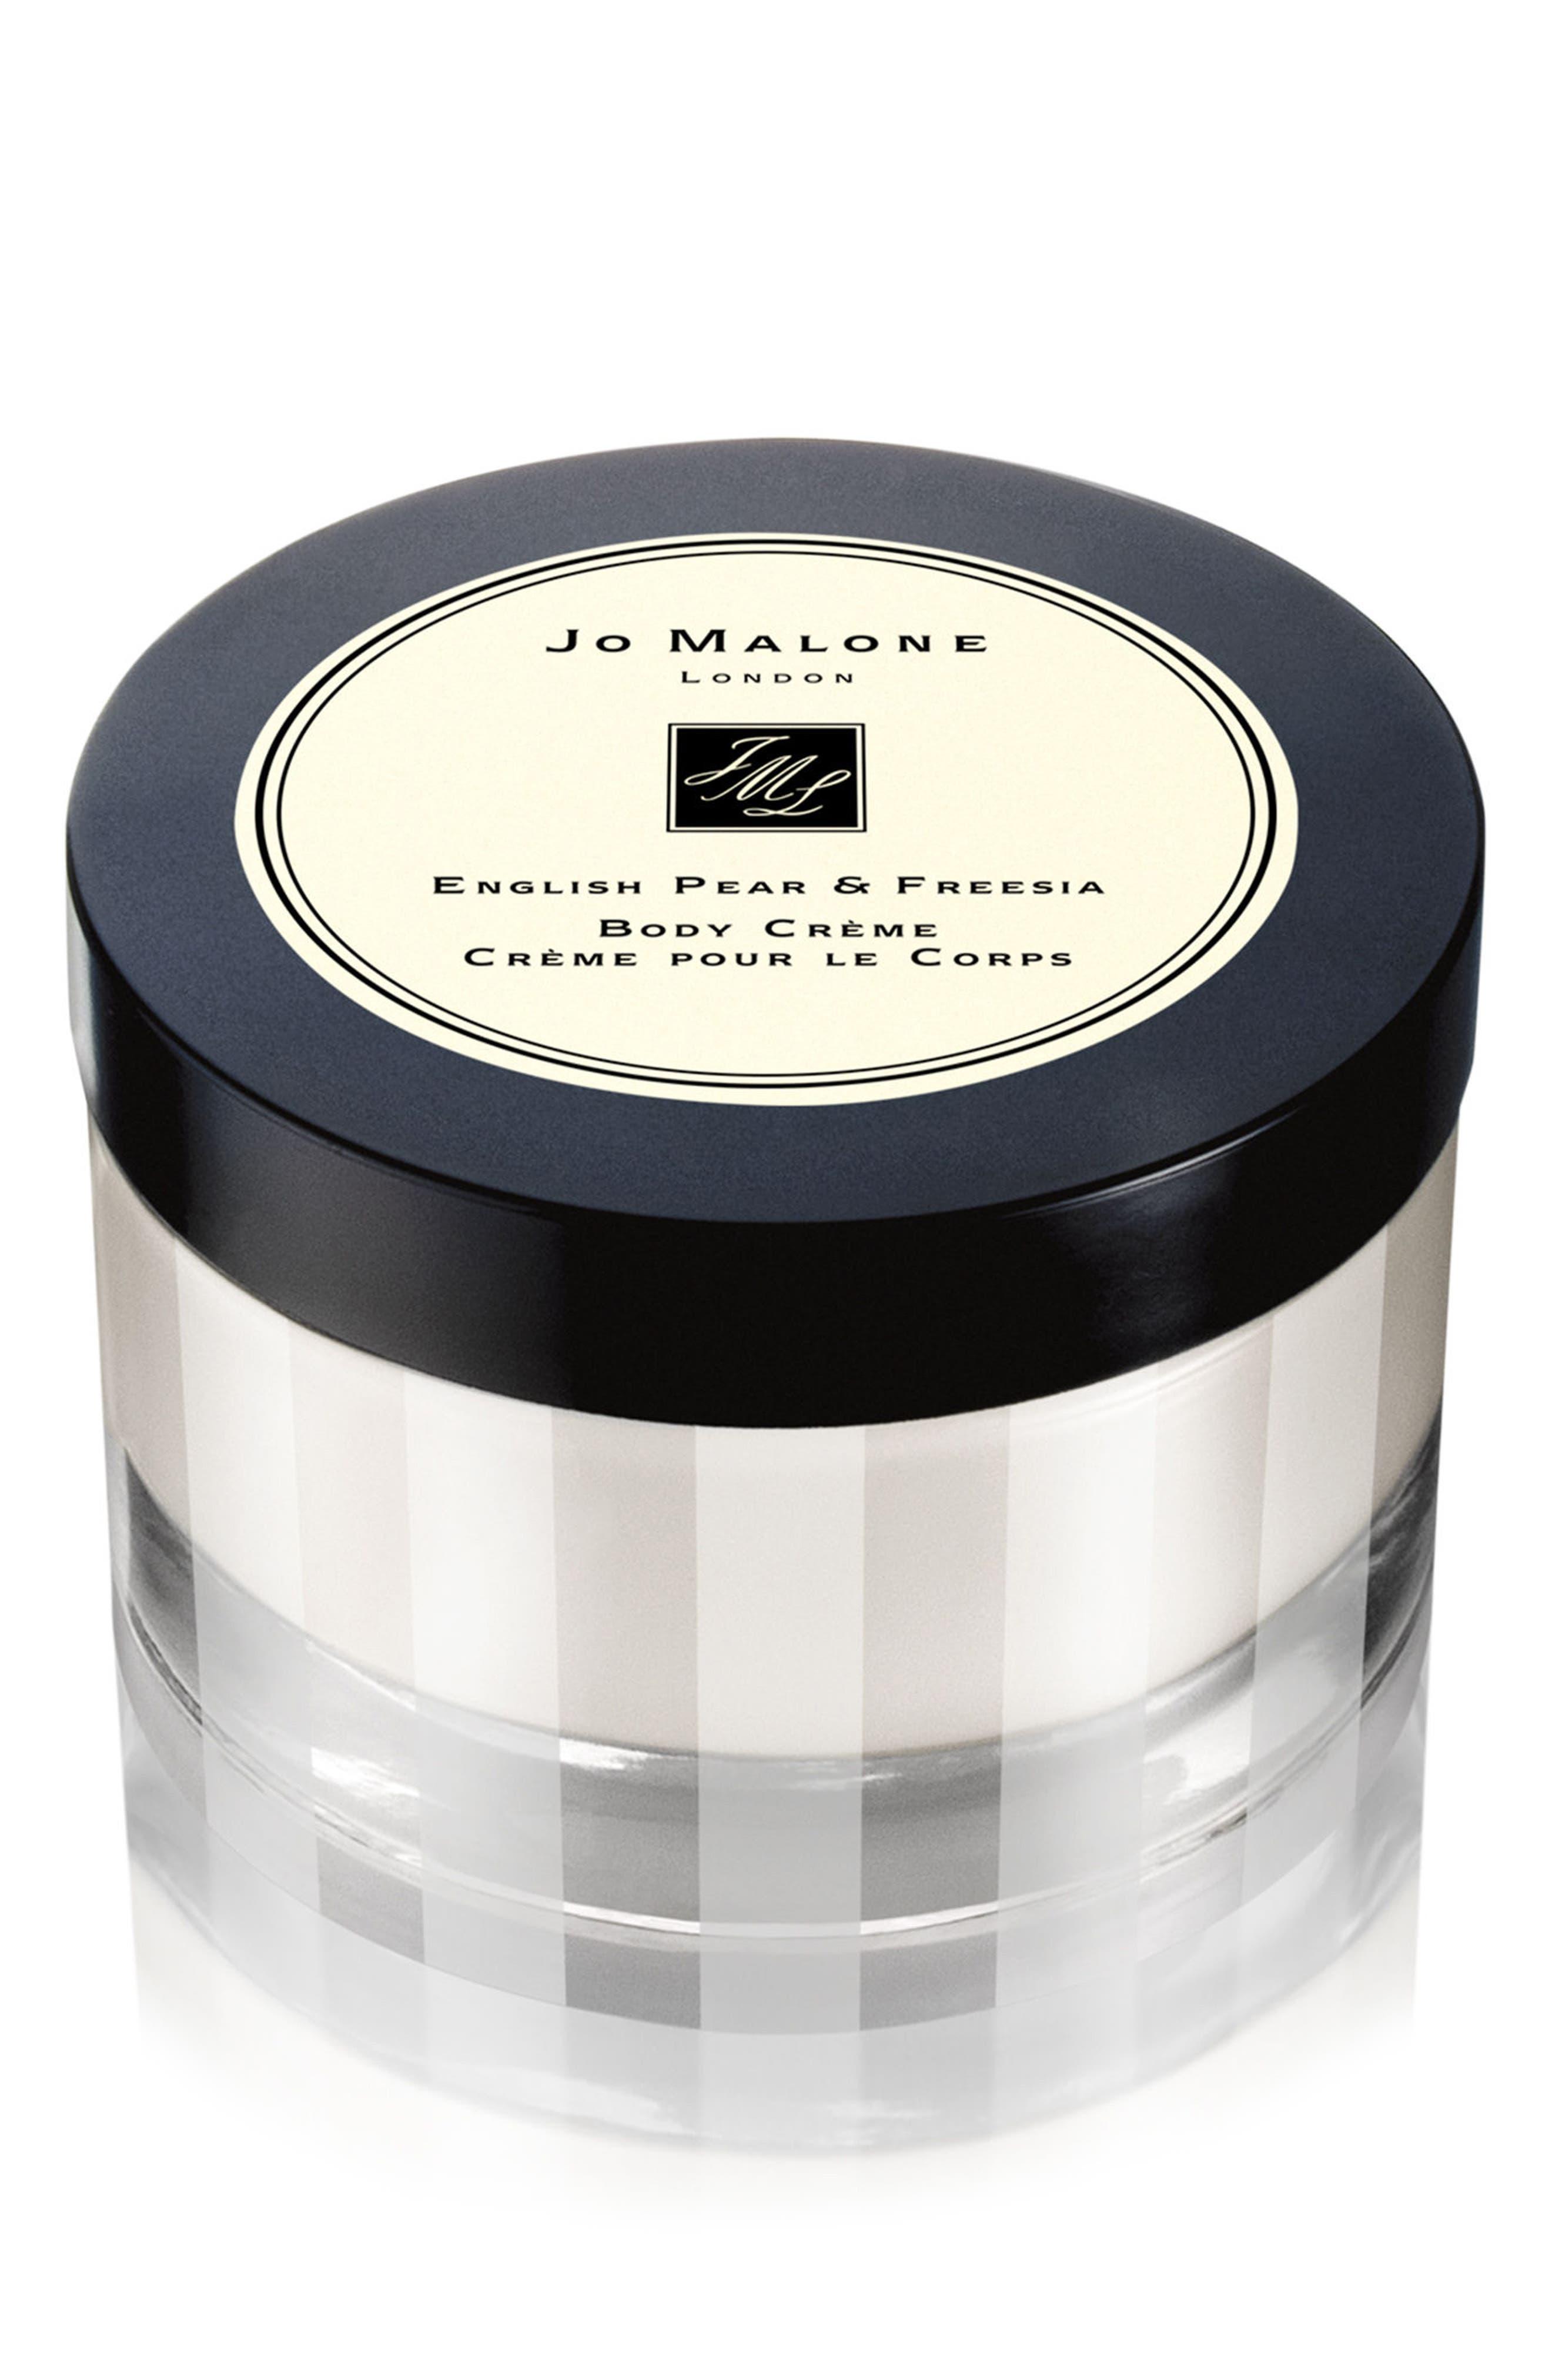 Jo Malone London™ 'English Pear & Freesia' Body Crème